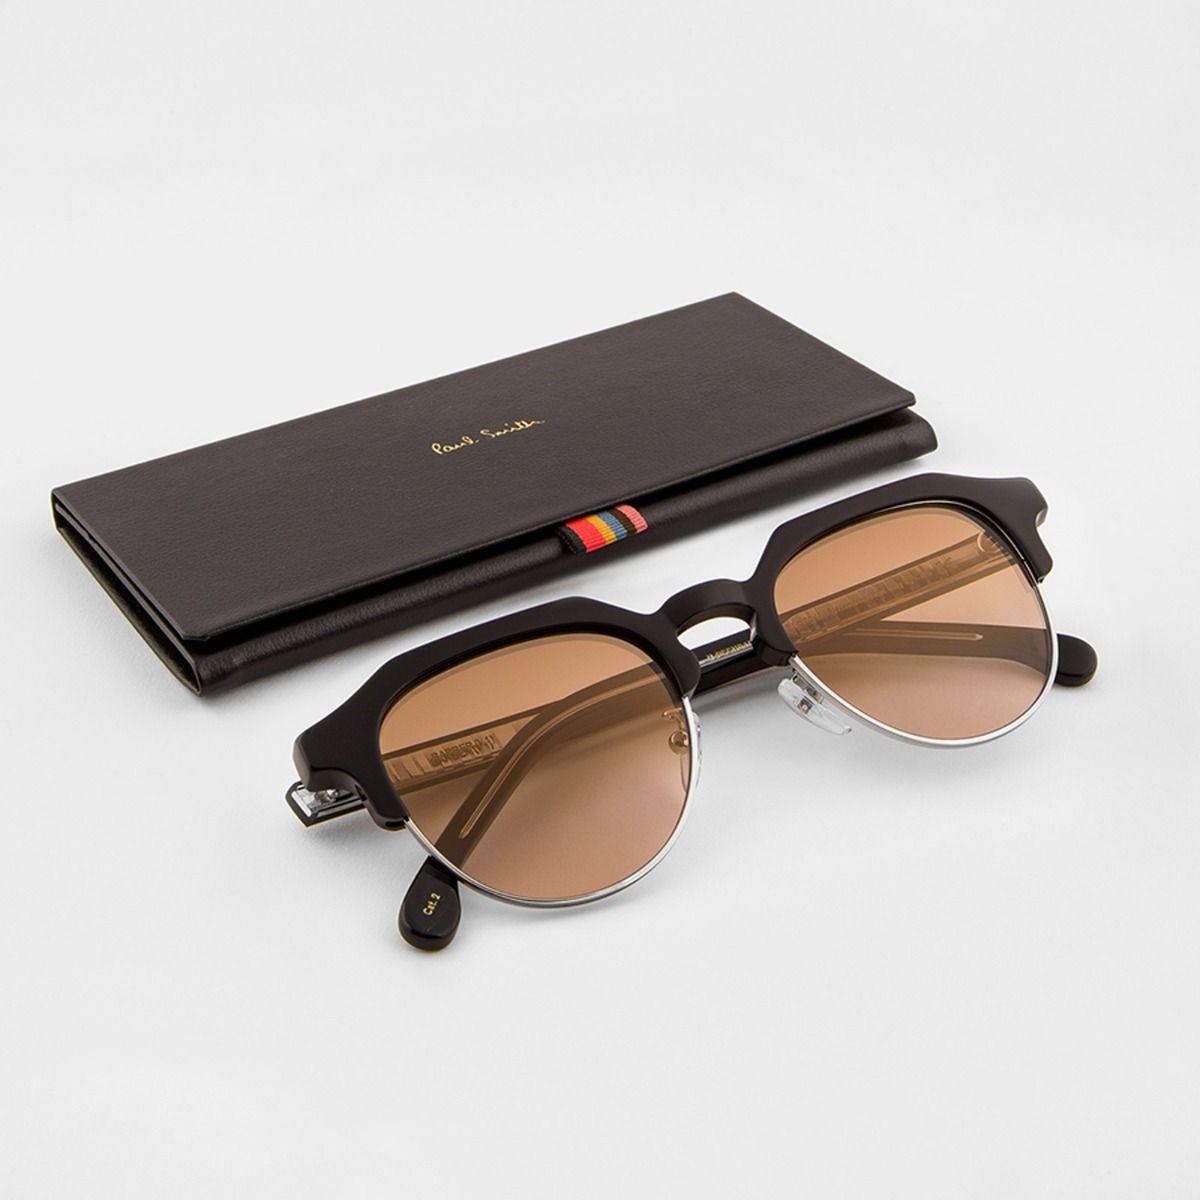 Paul Smith Barber Round Sunglasses